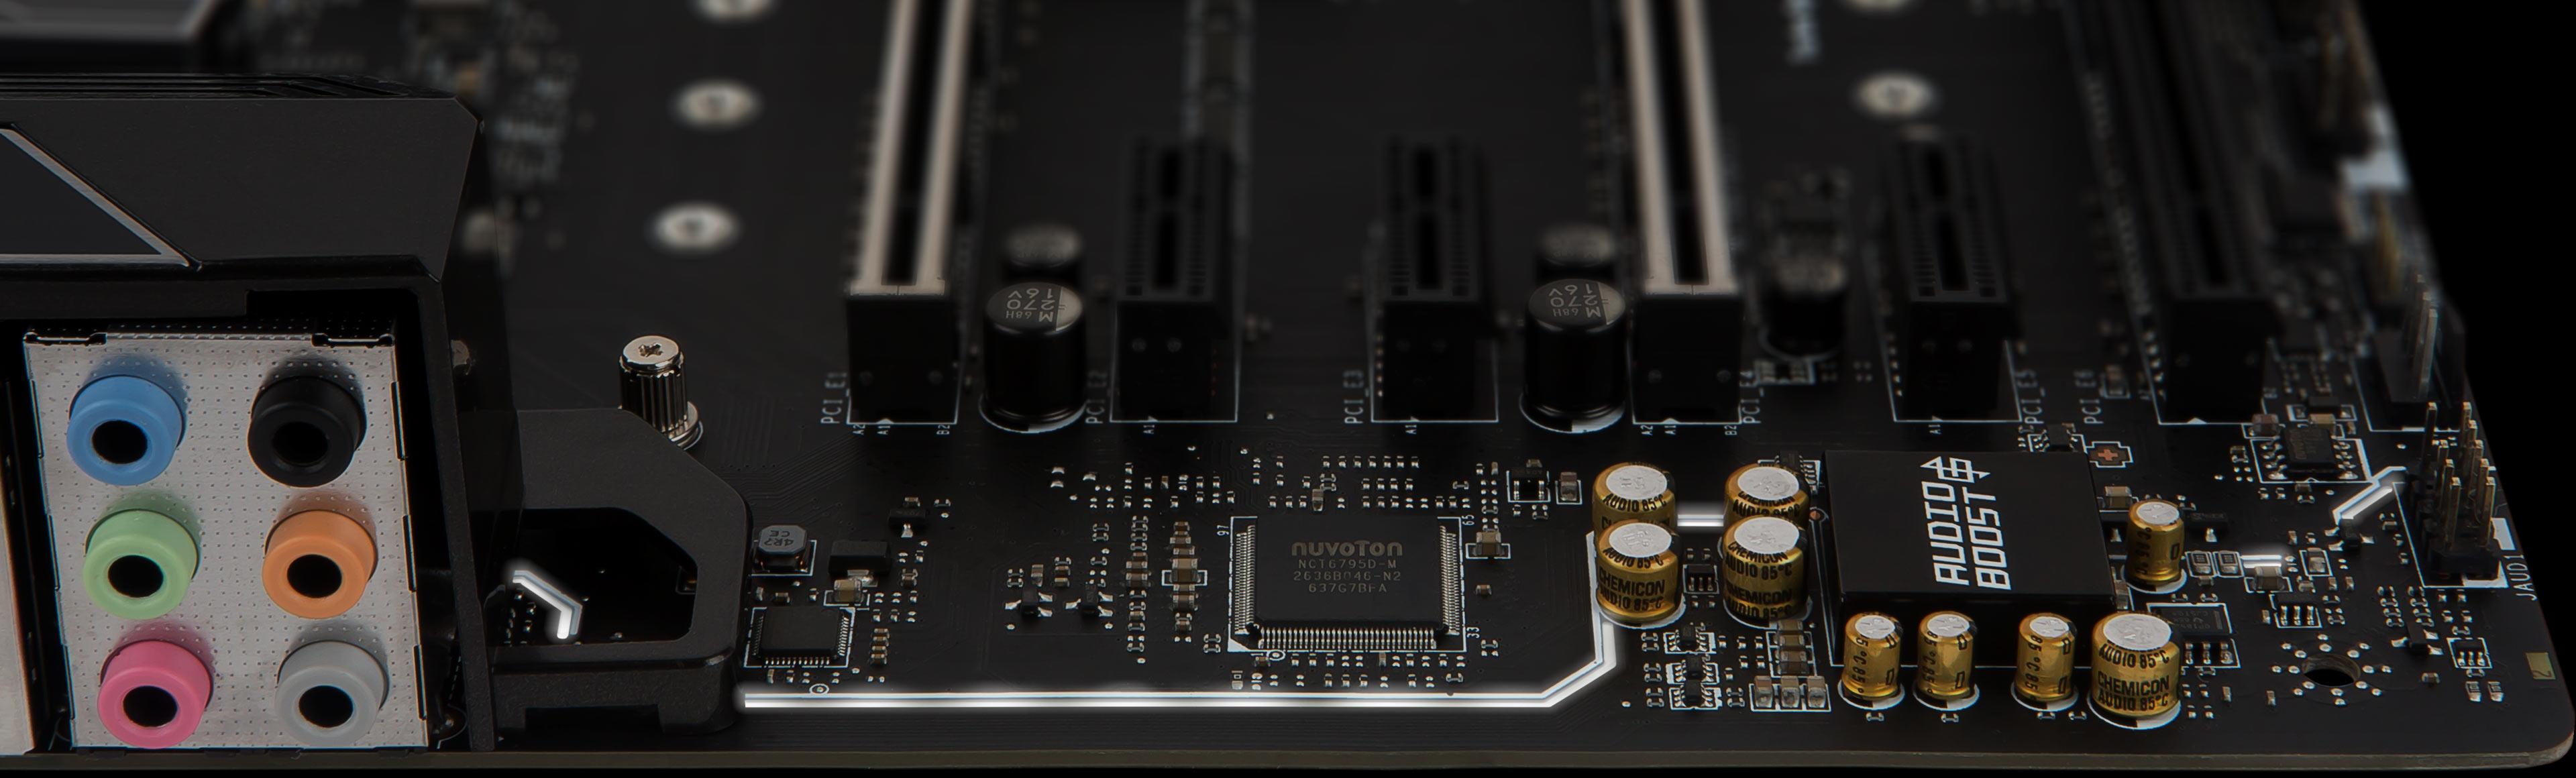 Z270 Sli Plus Motherboard The World Leader In Design Ram 7 Way Plug Wiring Diagram Msi Global